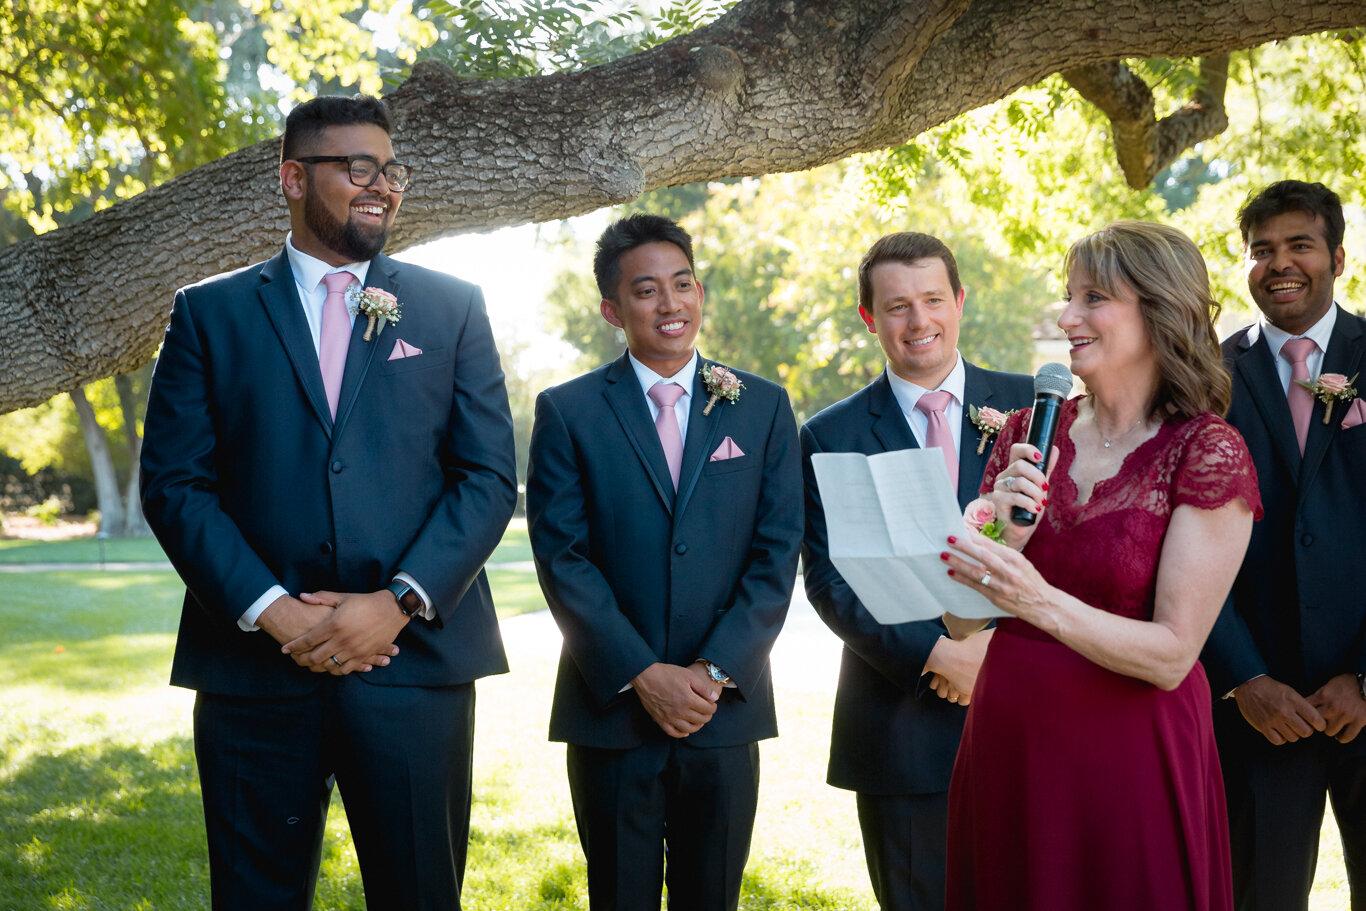 2019.08.24_Emily-Ashir-Wedding-at-the-Maples-5823.jpg